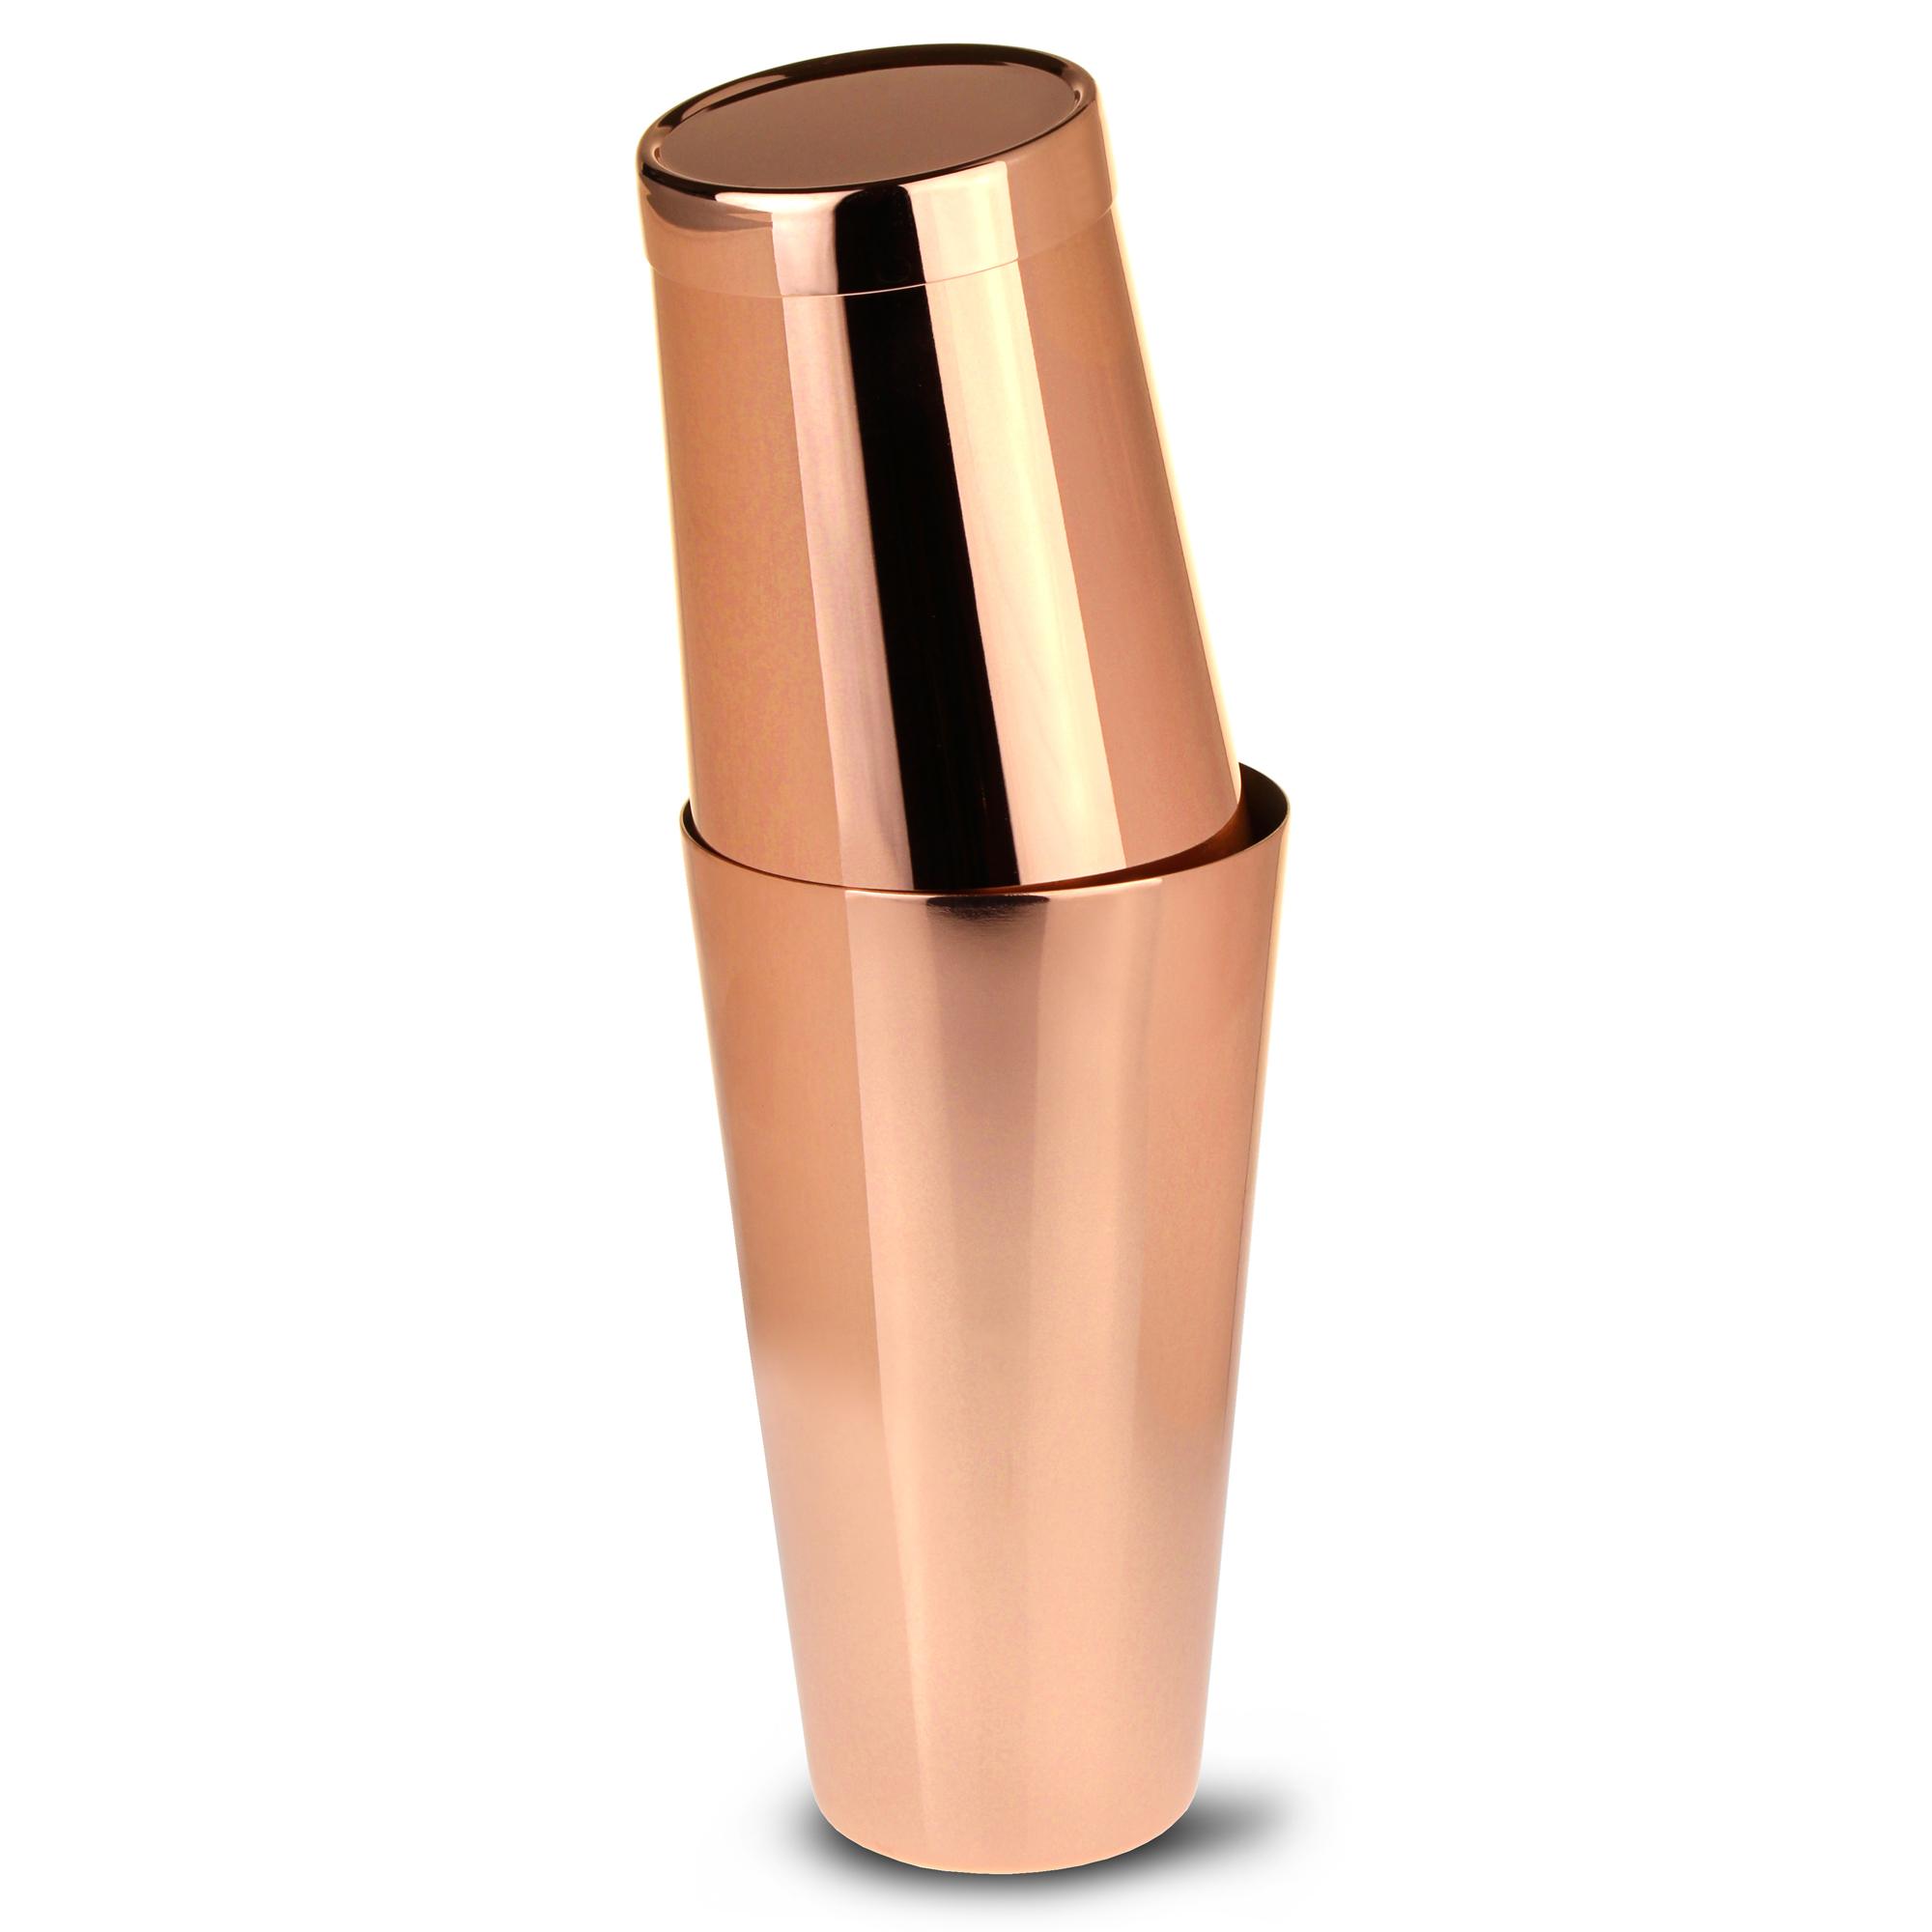 Copper Tin on Tin Boston Cocktail Shaker at drinkstuff